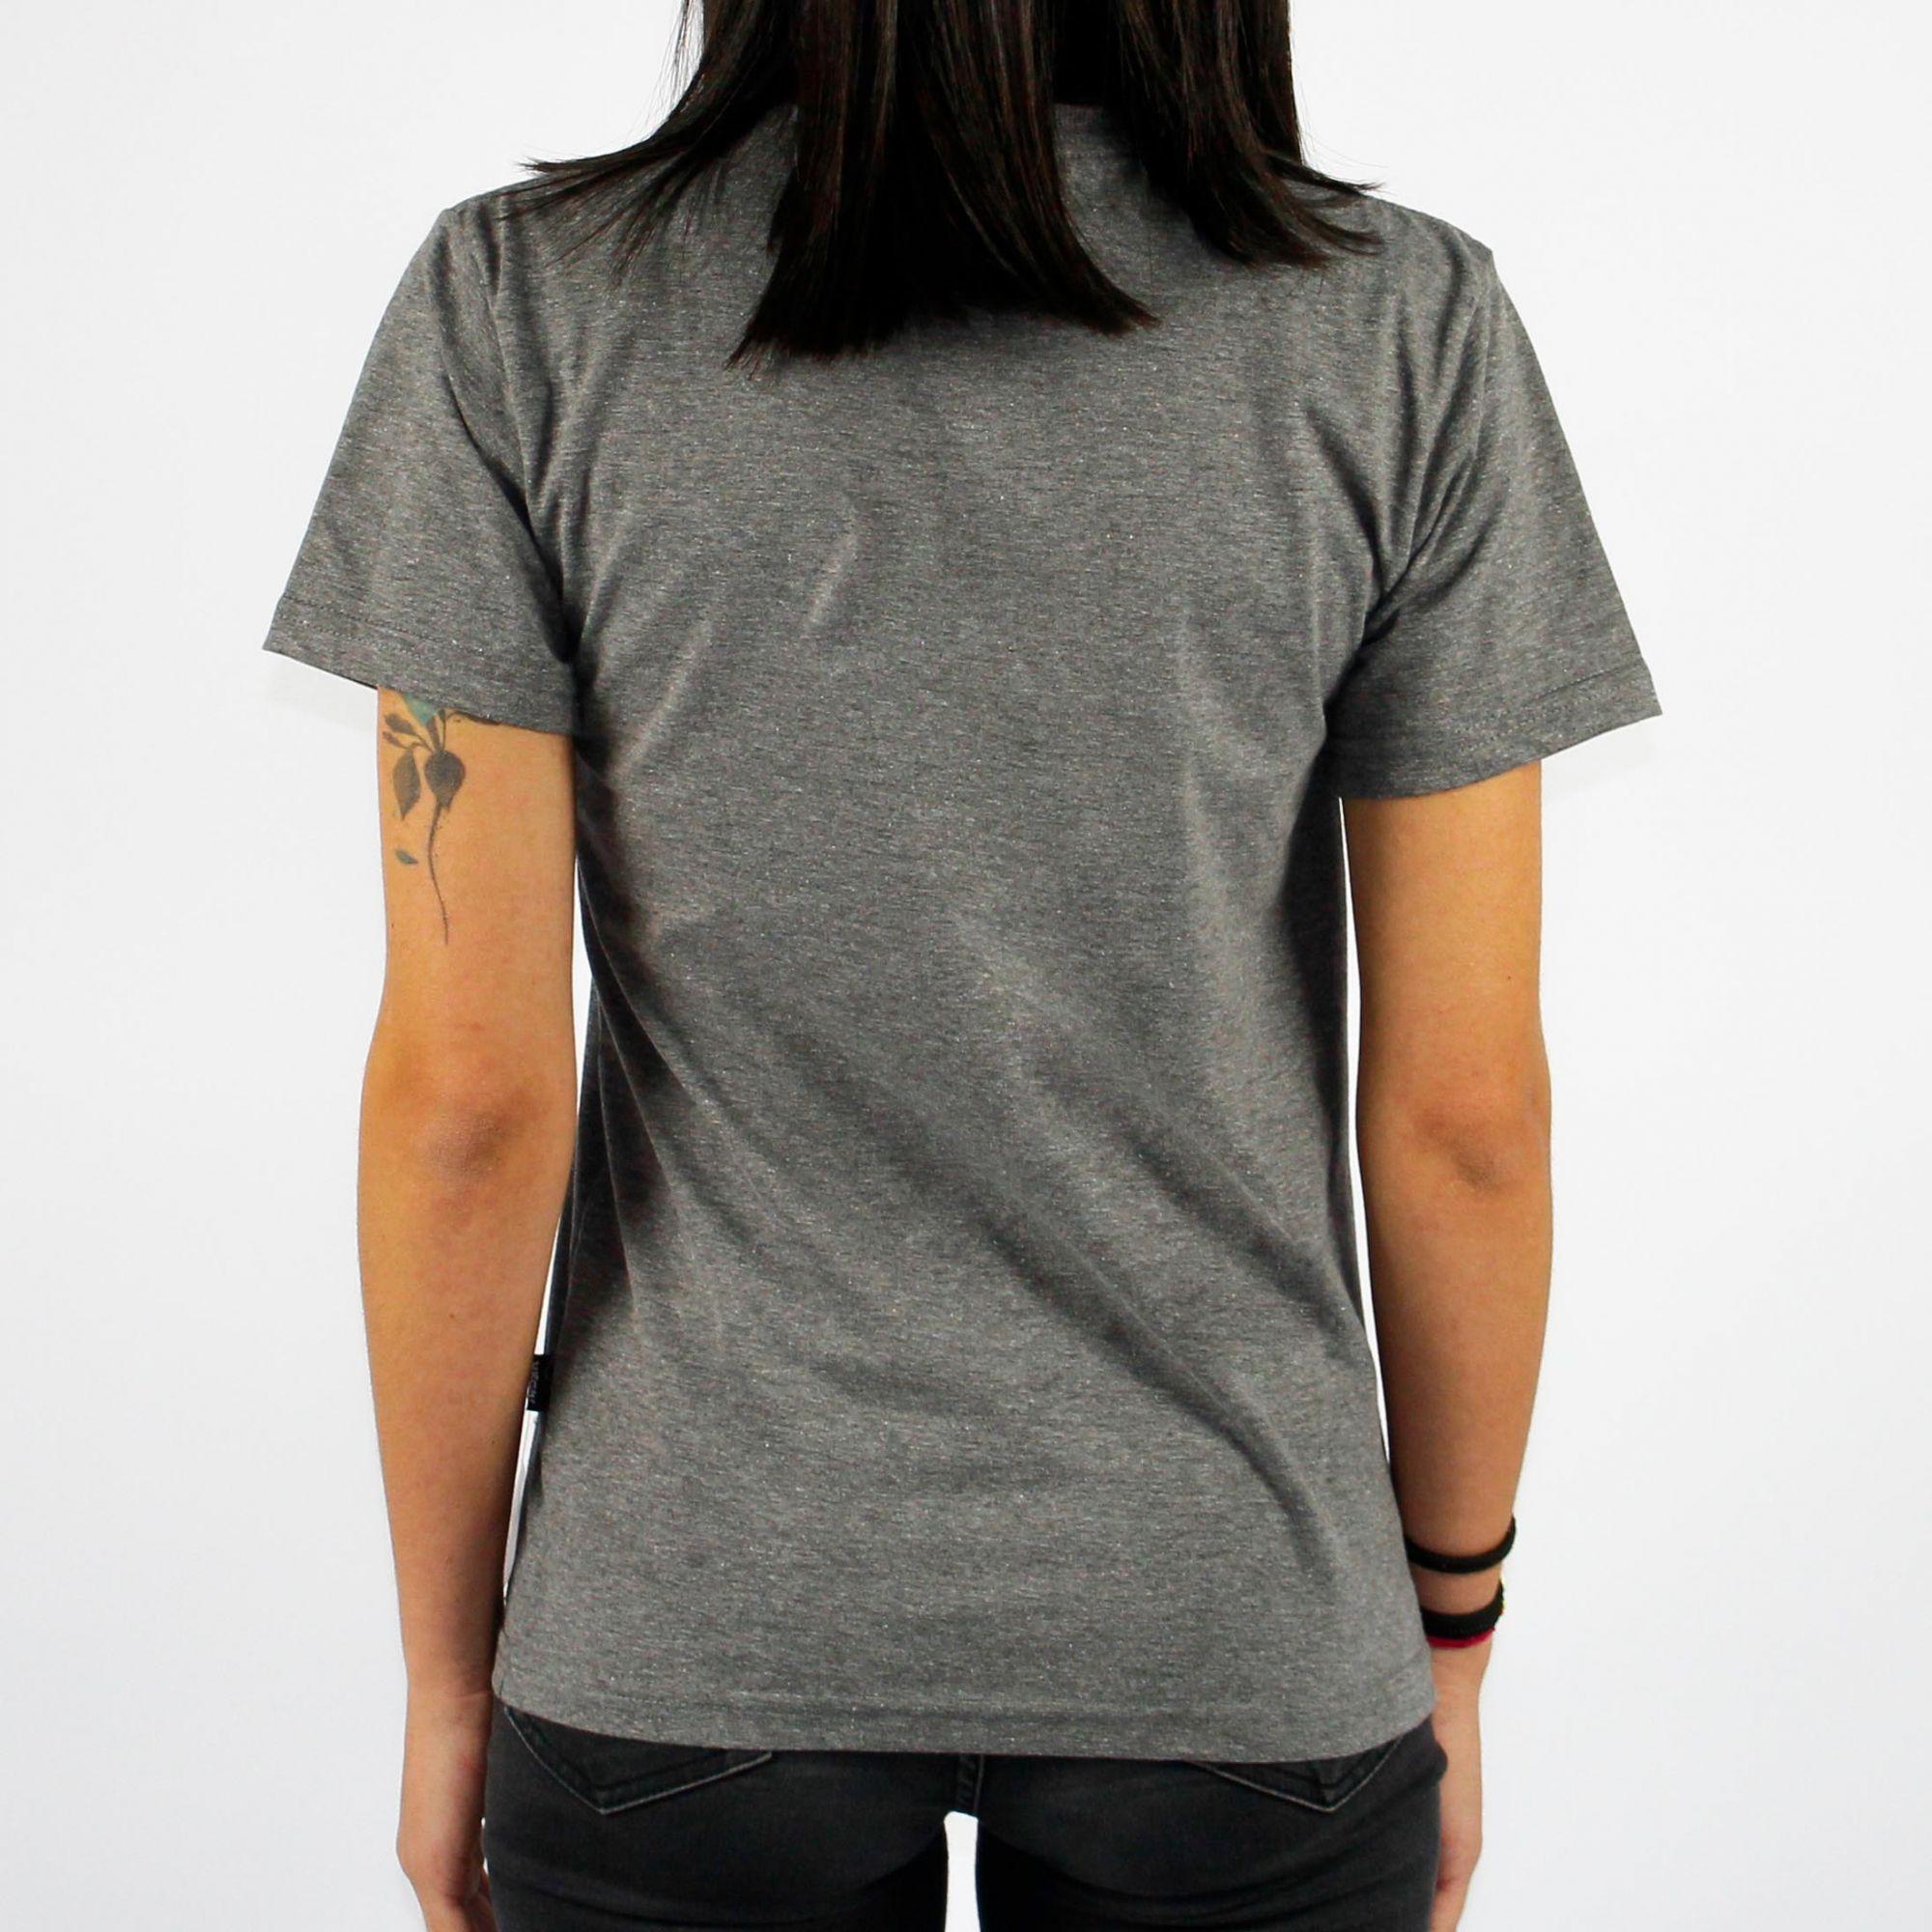 Camiseta Feminina Urgh Classic Cinza Mescla Escuro